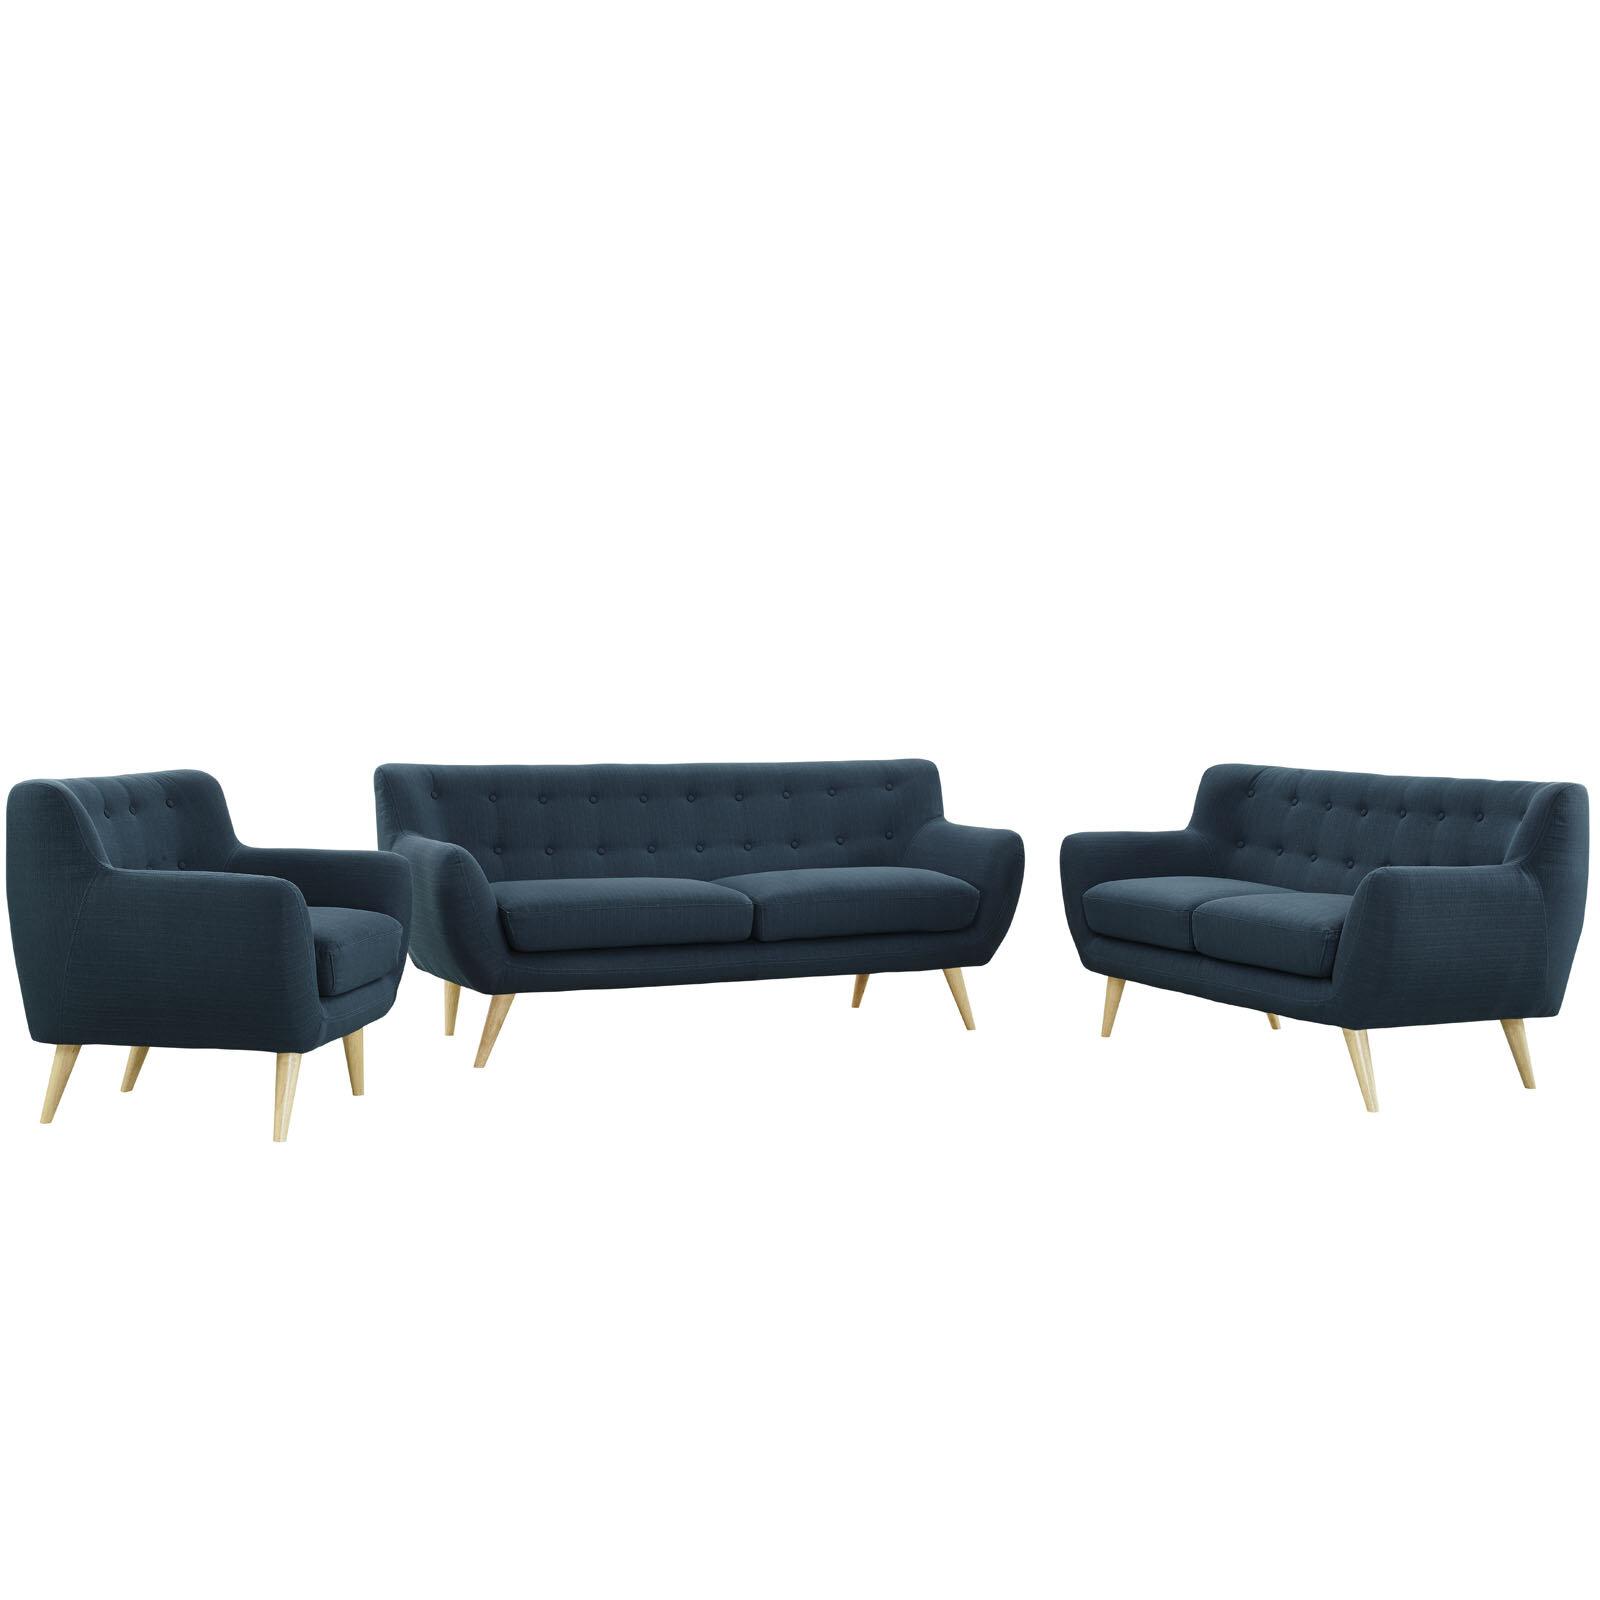 Stevie 3 Piece Living Room Set Reviews Allmodern